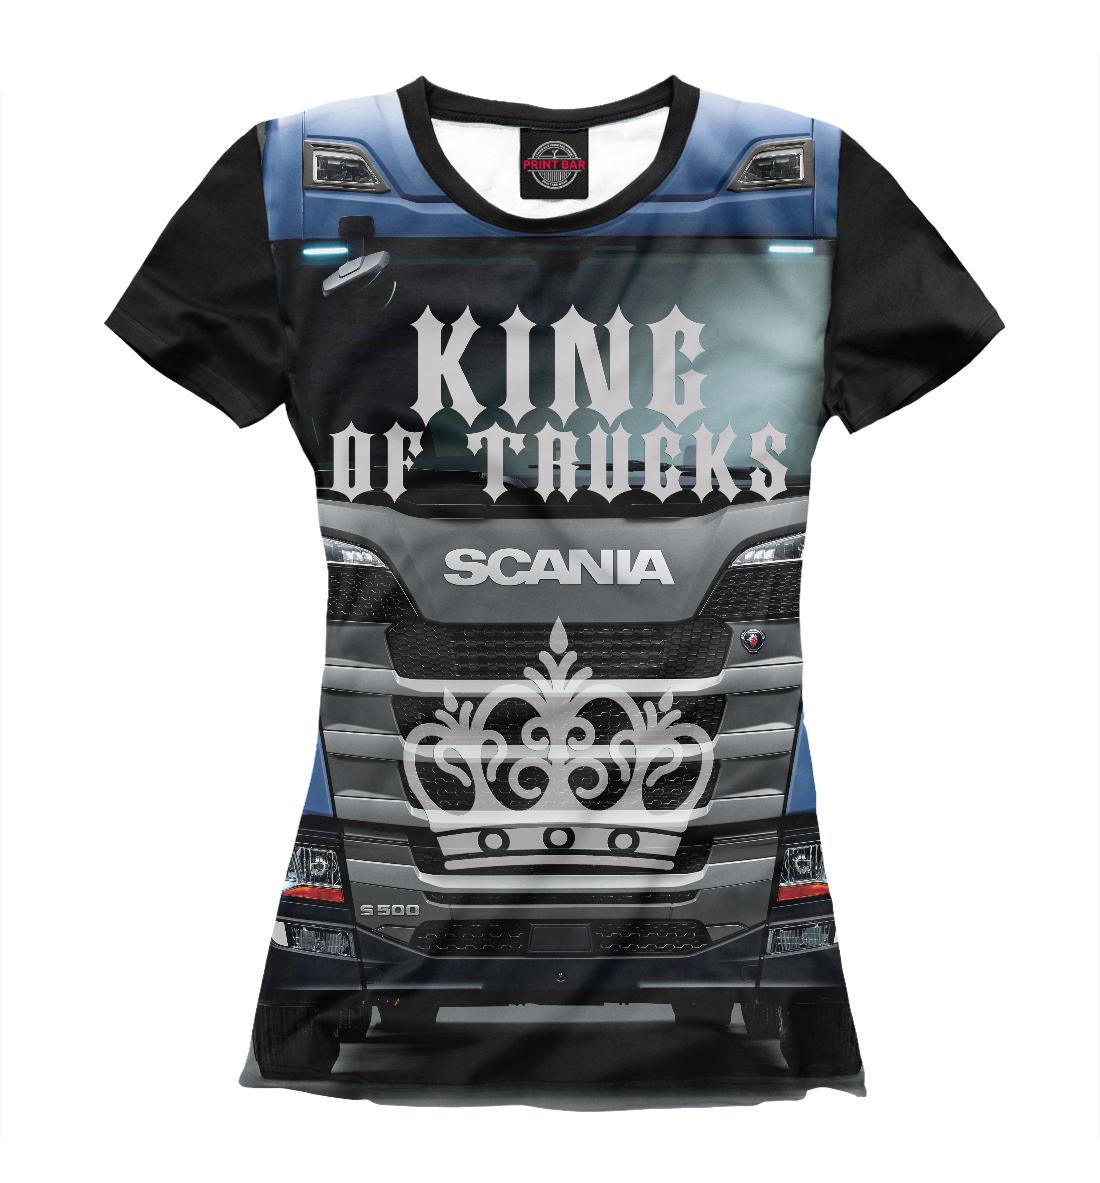 SCANIA - король грузовиков, Printbar, Футболки, GRZ-768093-fut-1  - купить со скидкой